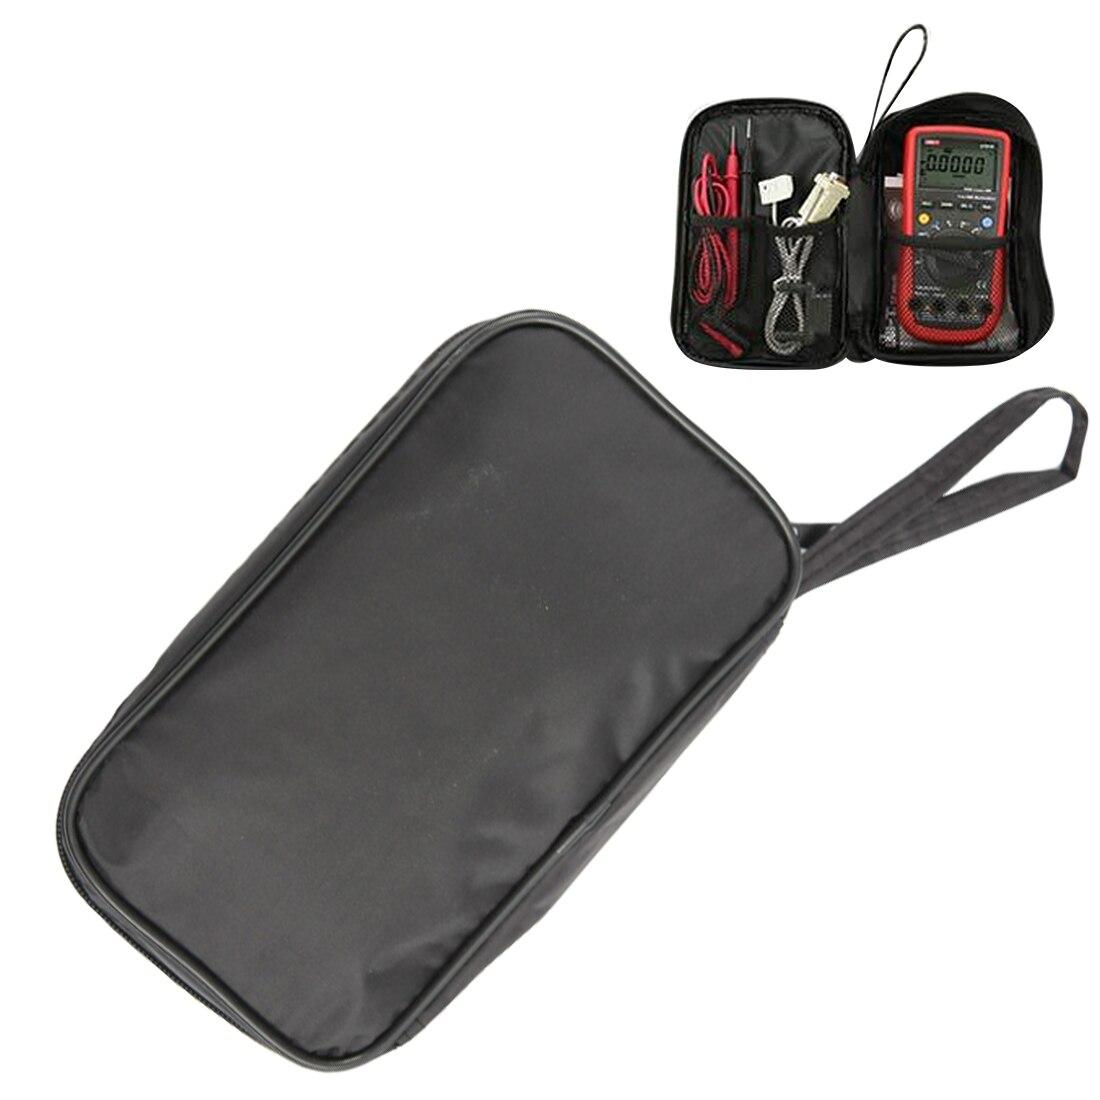 20*12*4cm Waterproof Tools Bag Multimeter Black Canvas Bag For UT61 Series Digital Multimeter Cloth Durable